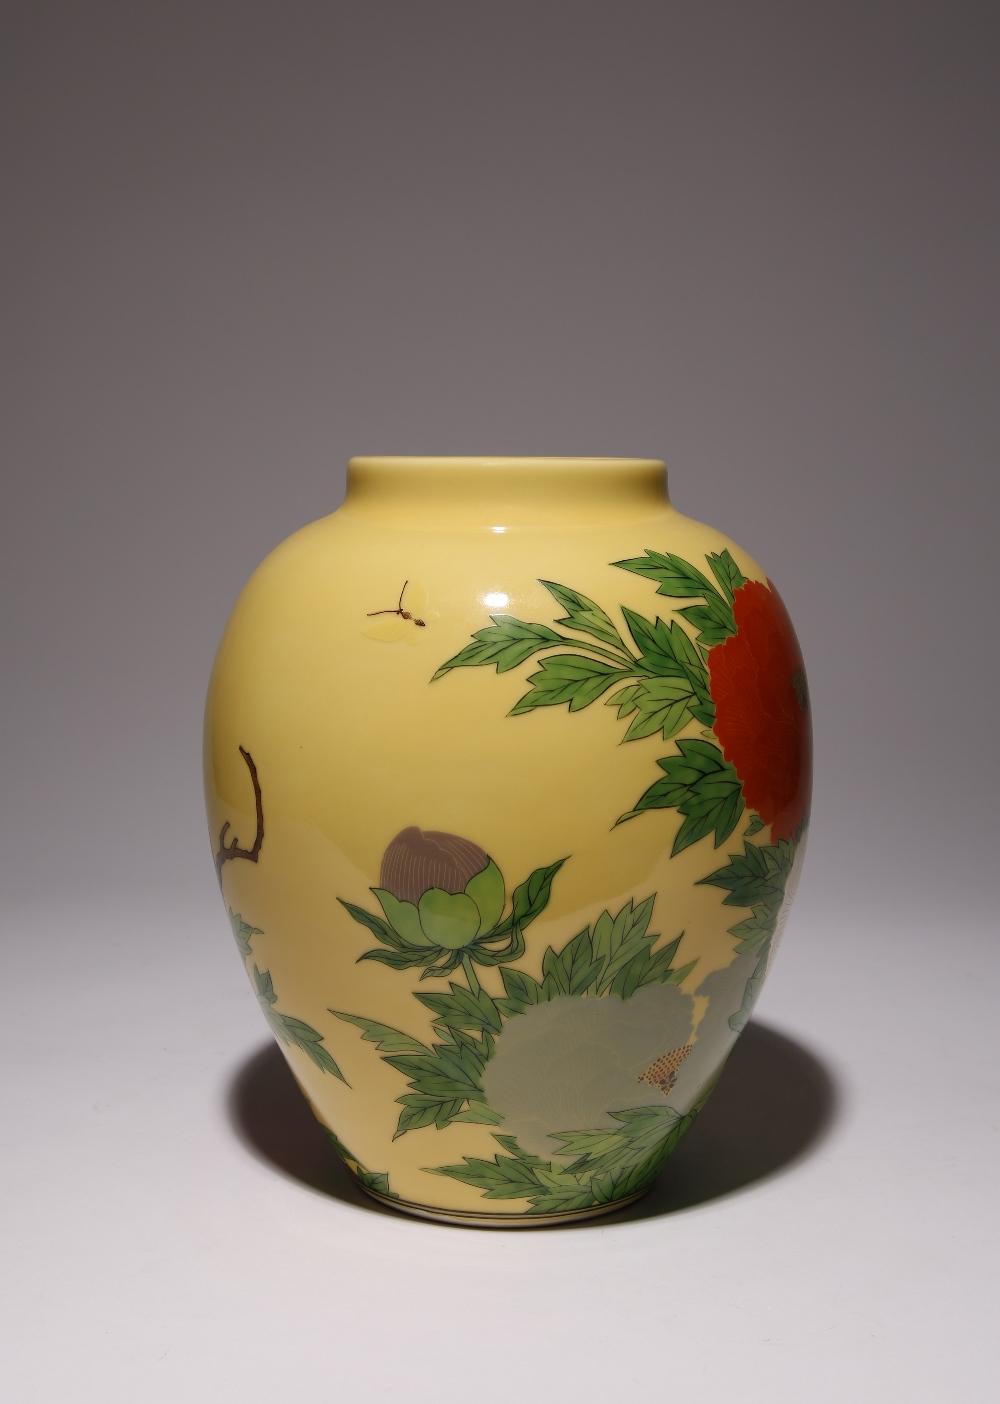 A JAPANESE VASE BY SEIFU YOHEI III (1851-1914) MEIJI OR TAISHO PERIOD, 20TH CENTURY The ovoid body